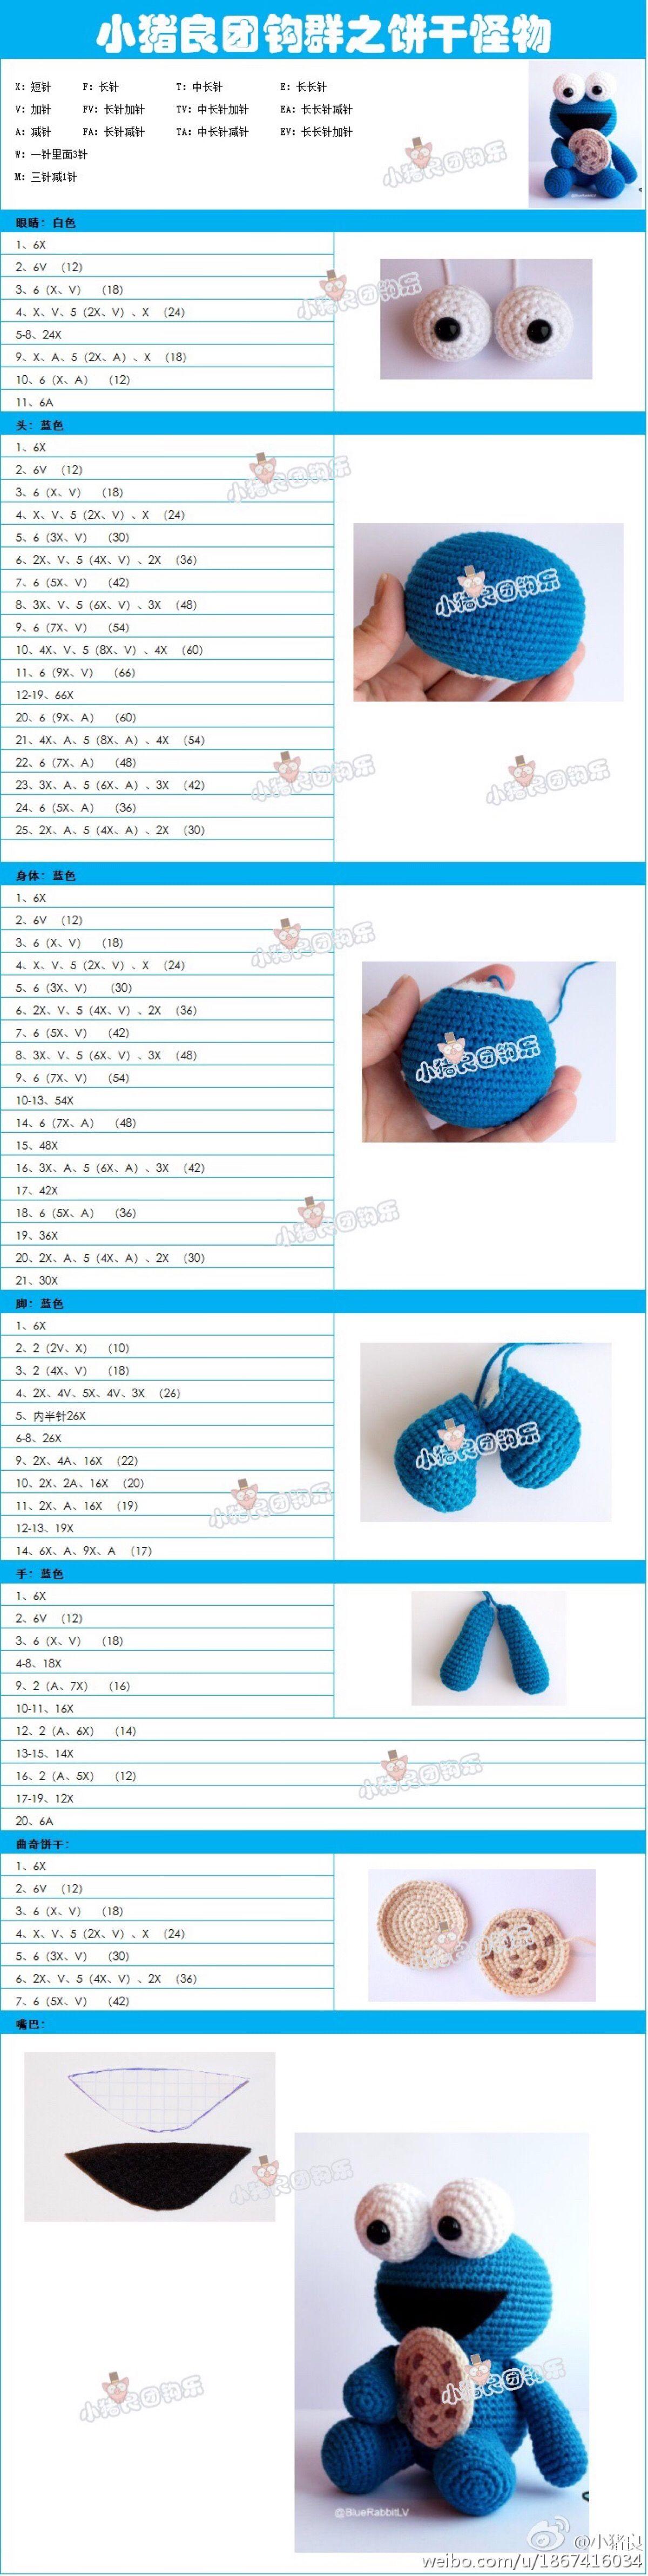 Pin de Sandra Morrissey en Crochet Doll Ideas | Pinterest | Patrones ...